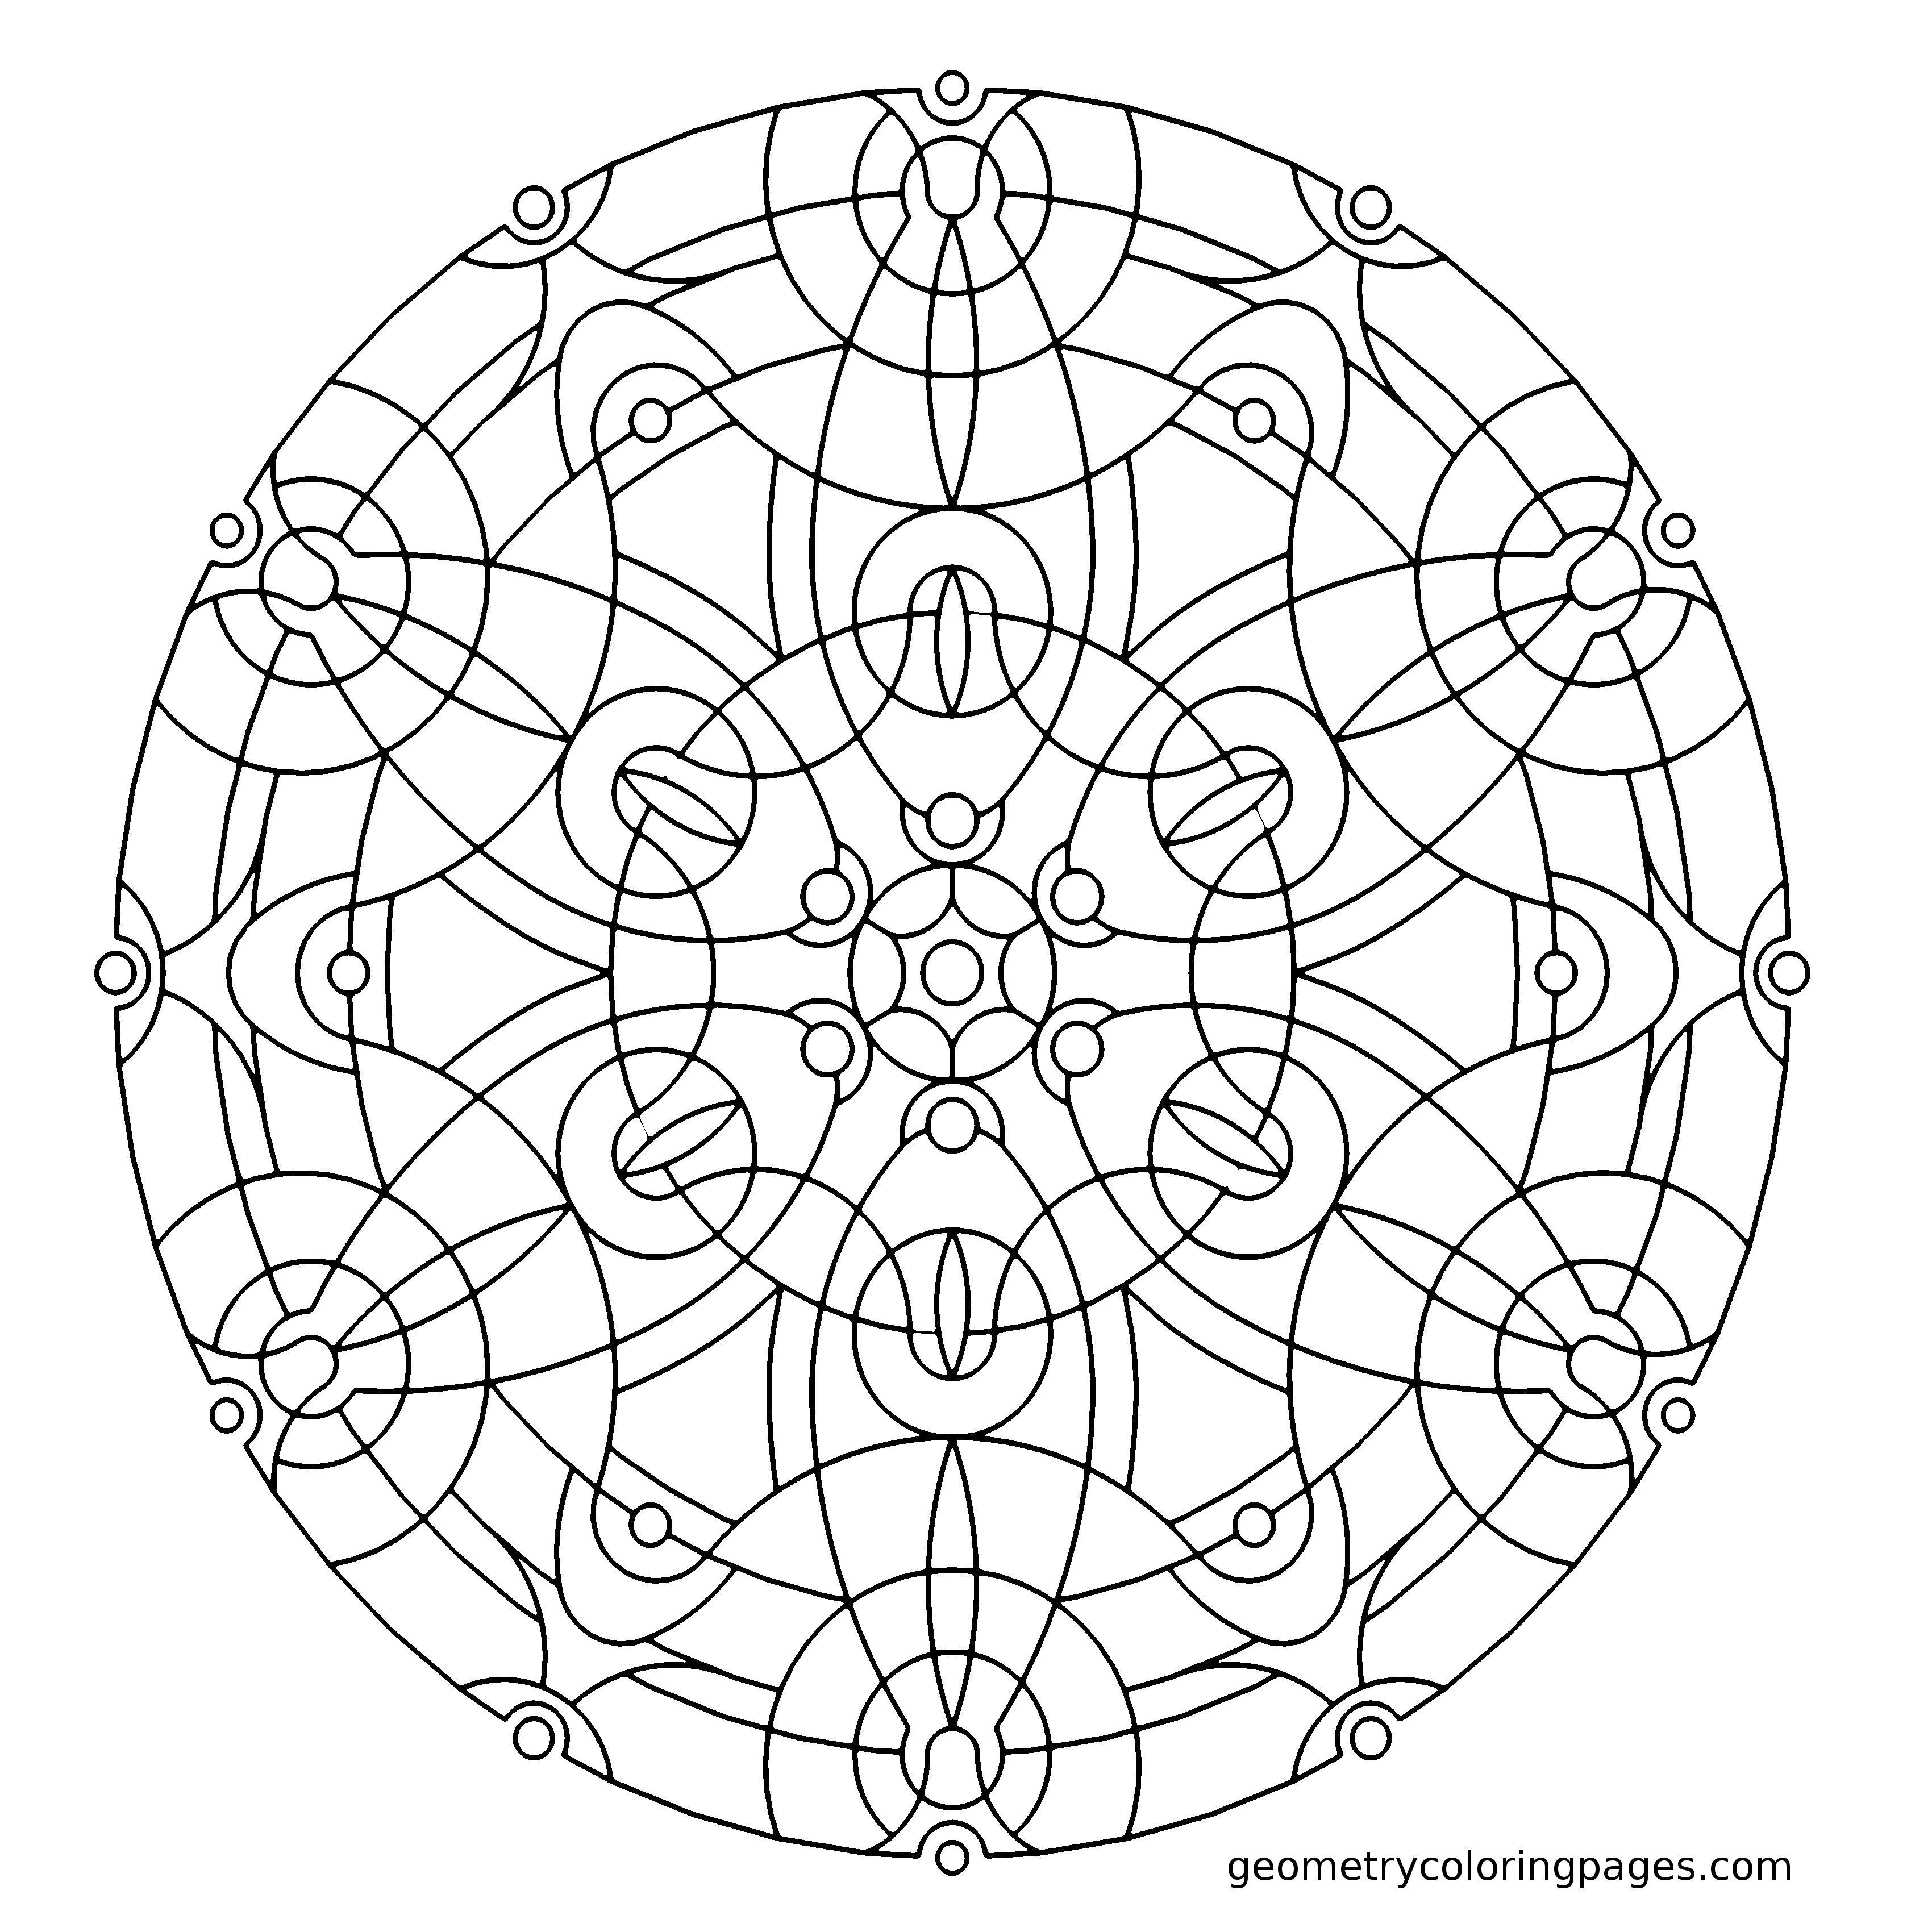 Uncategorized Coloring Mandalas For S coloring page mystery mandalas pinterest square mandala pages